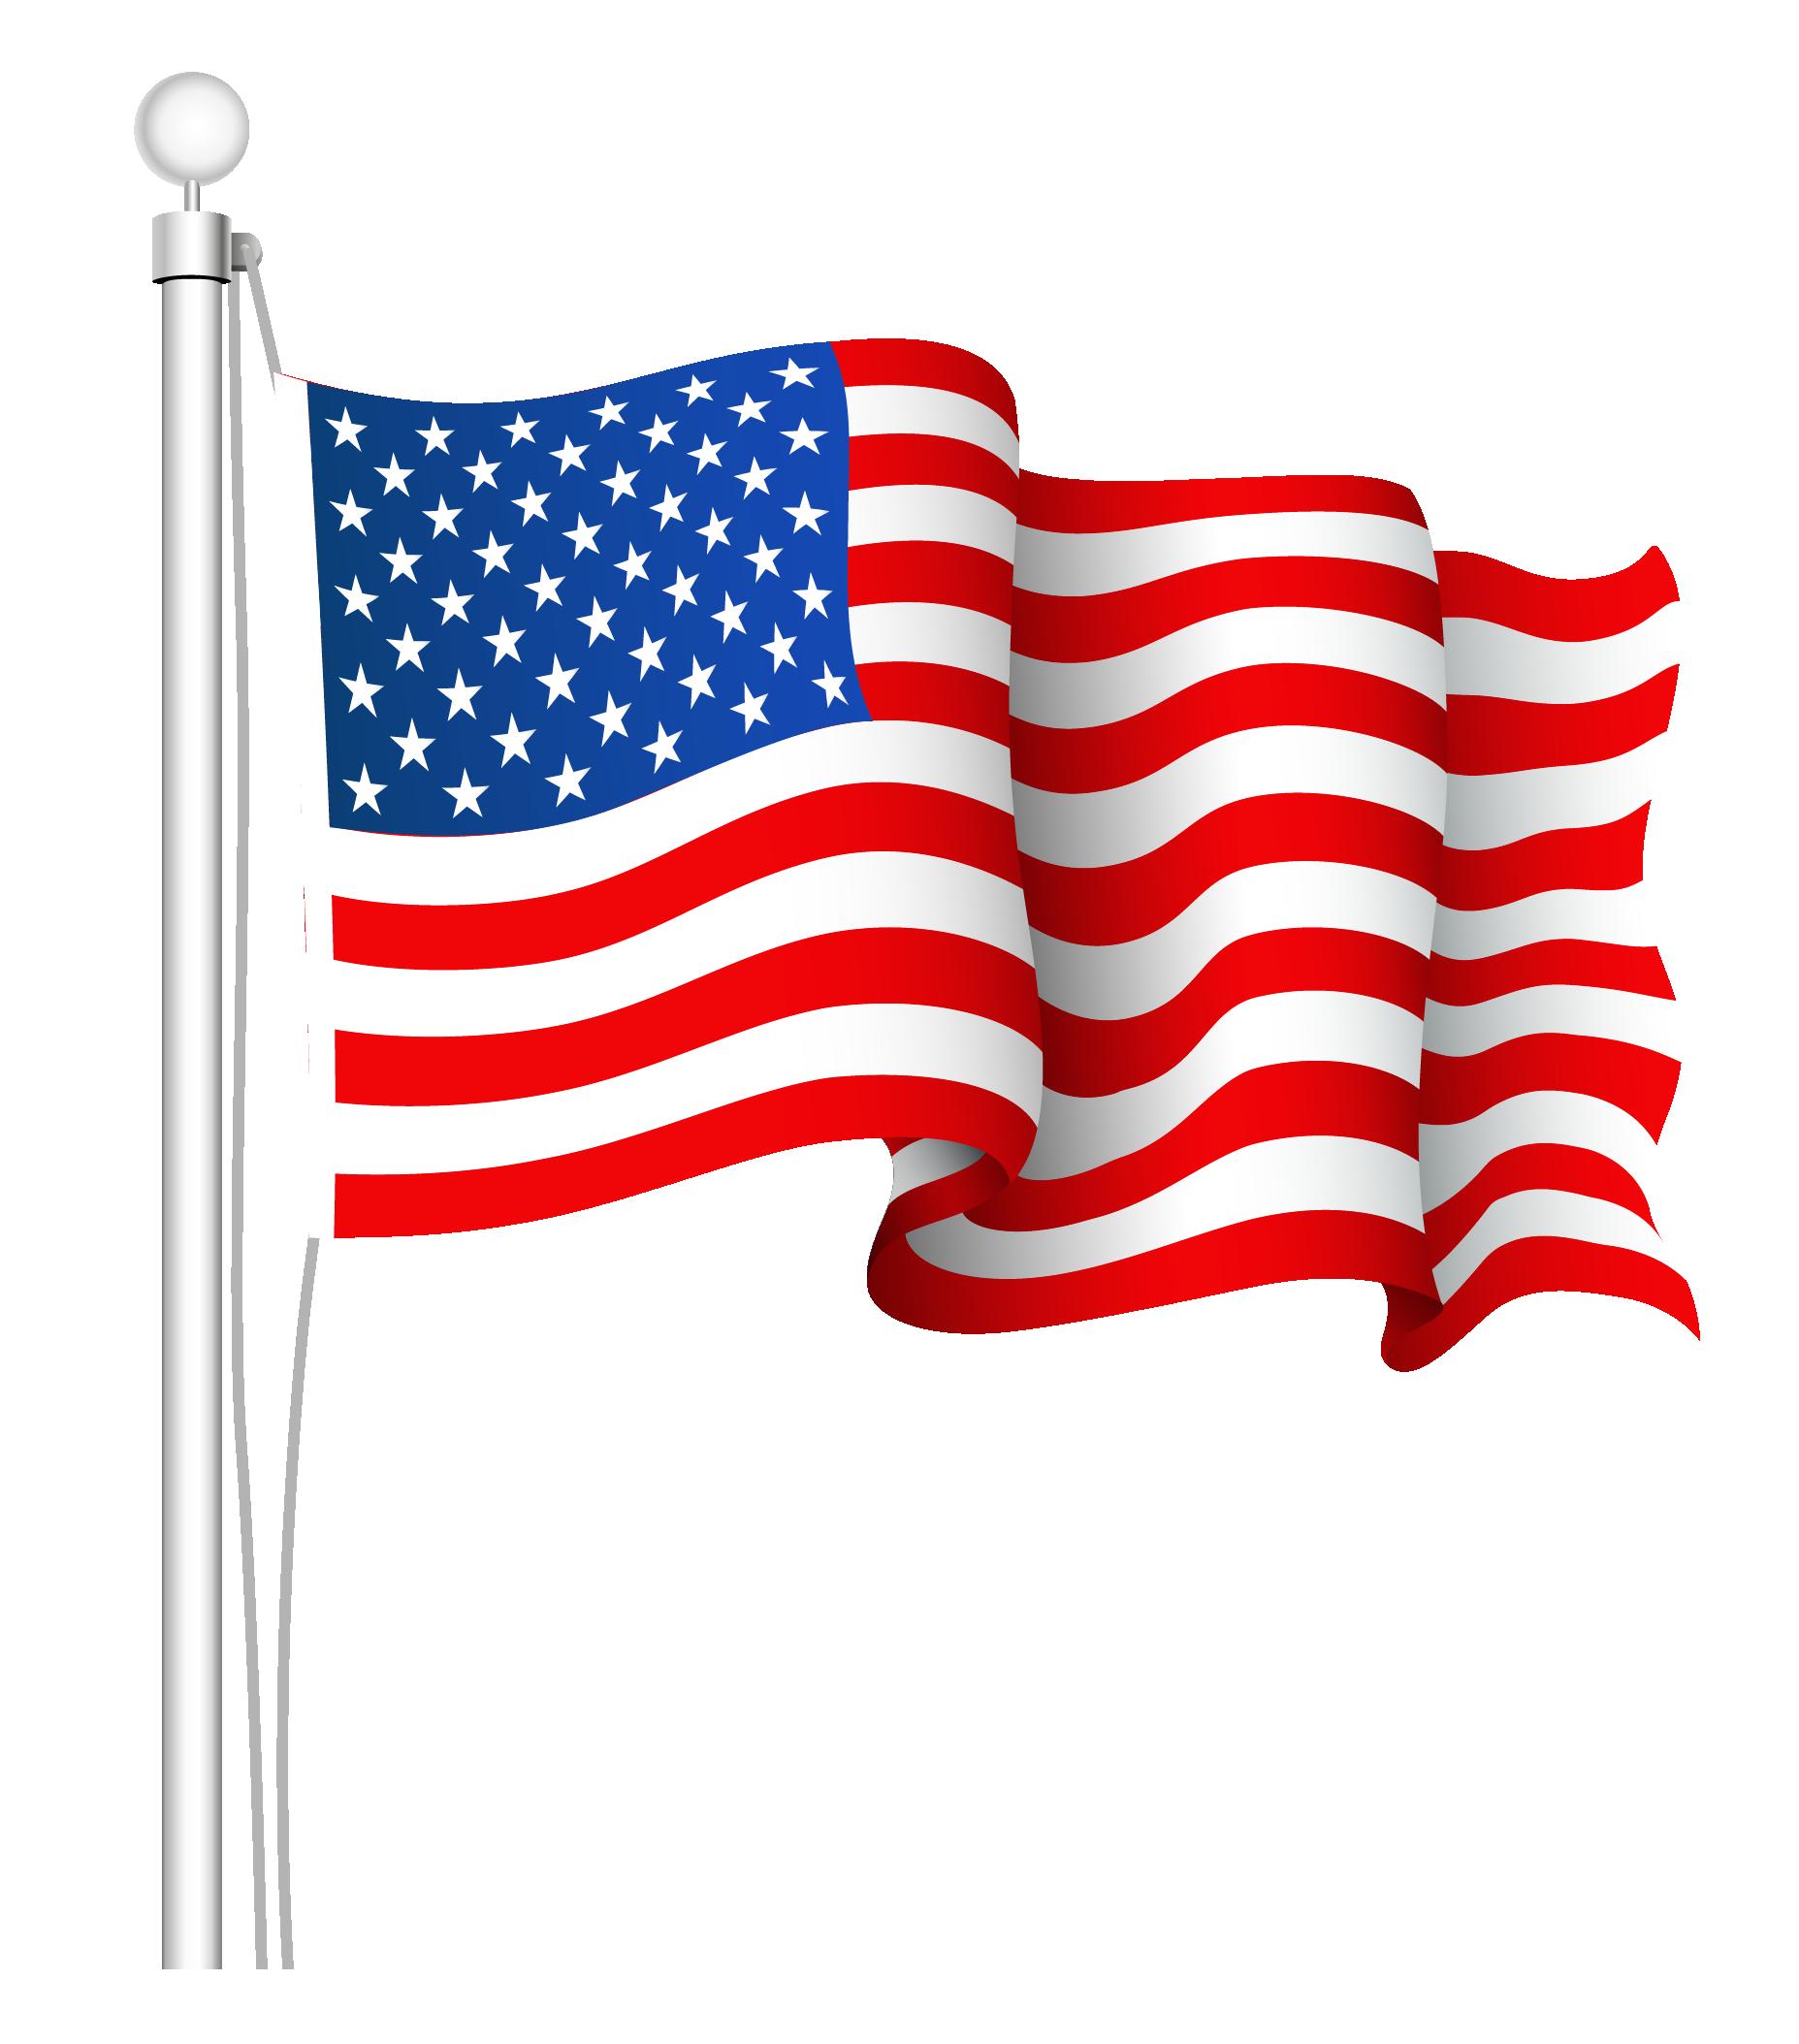 American flag united states .-American flag united states .-17